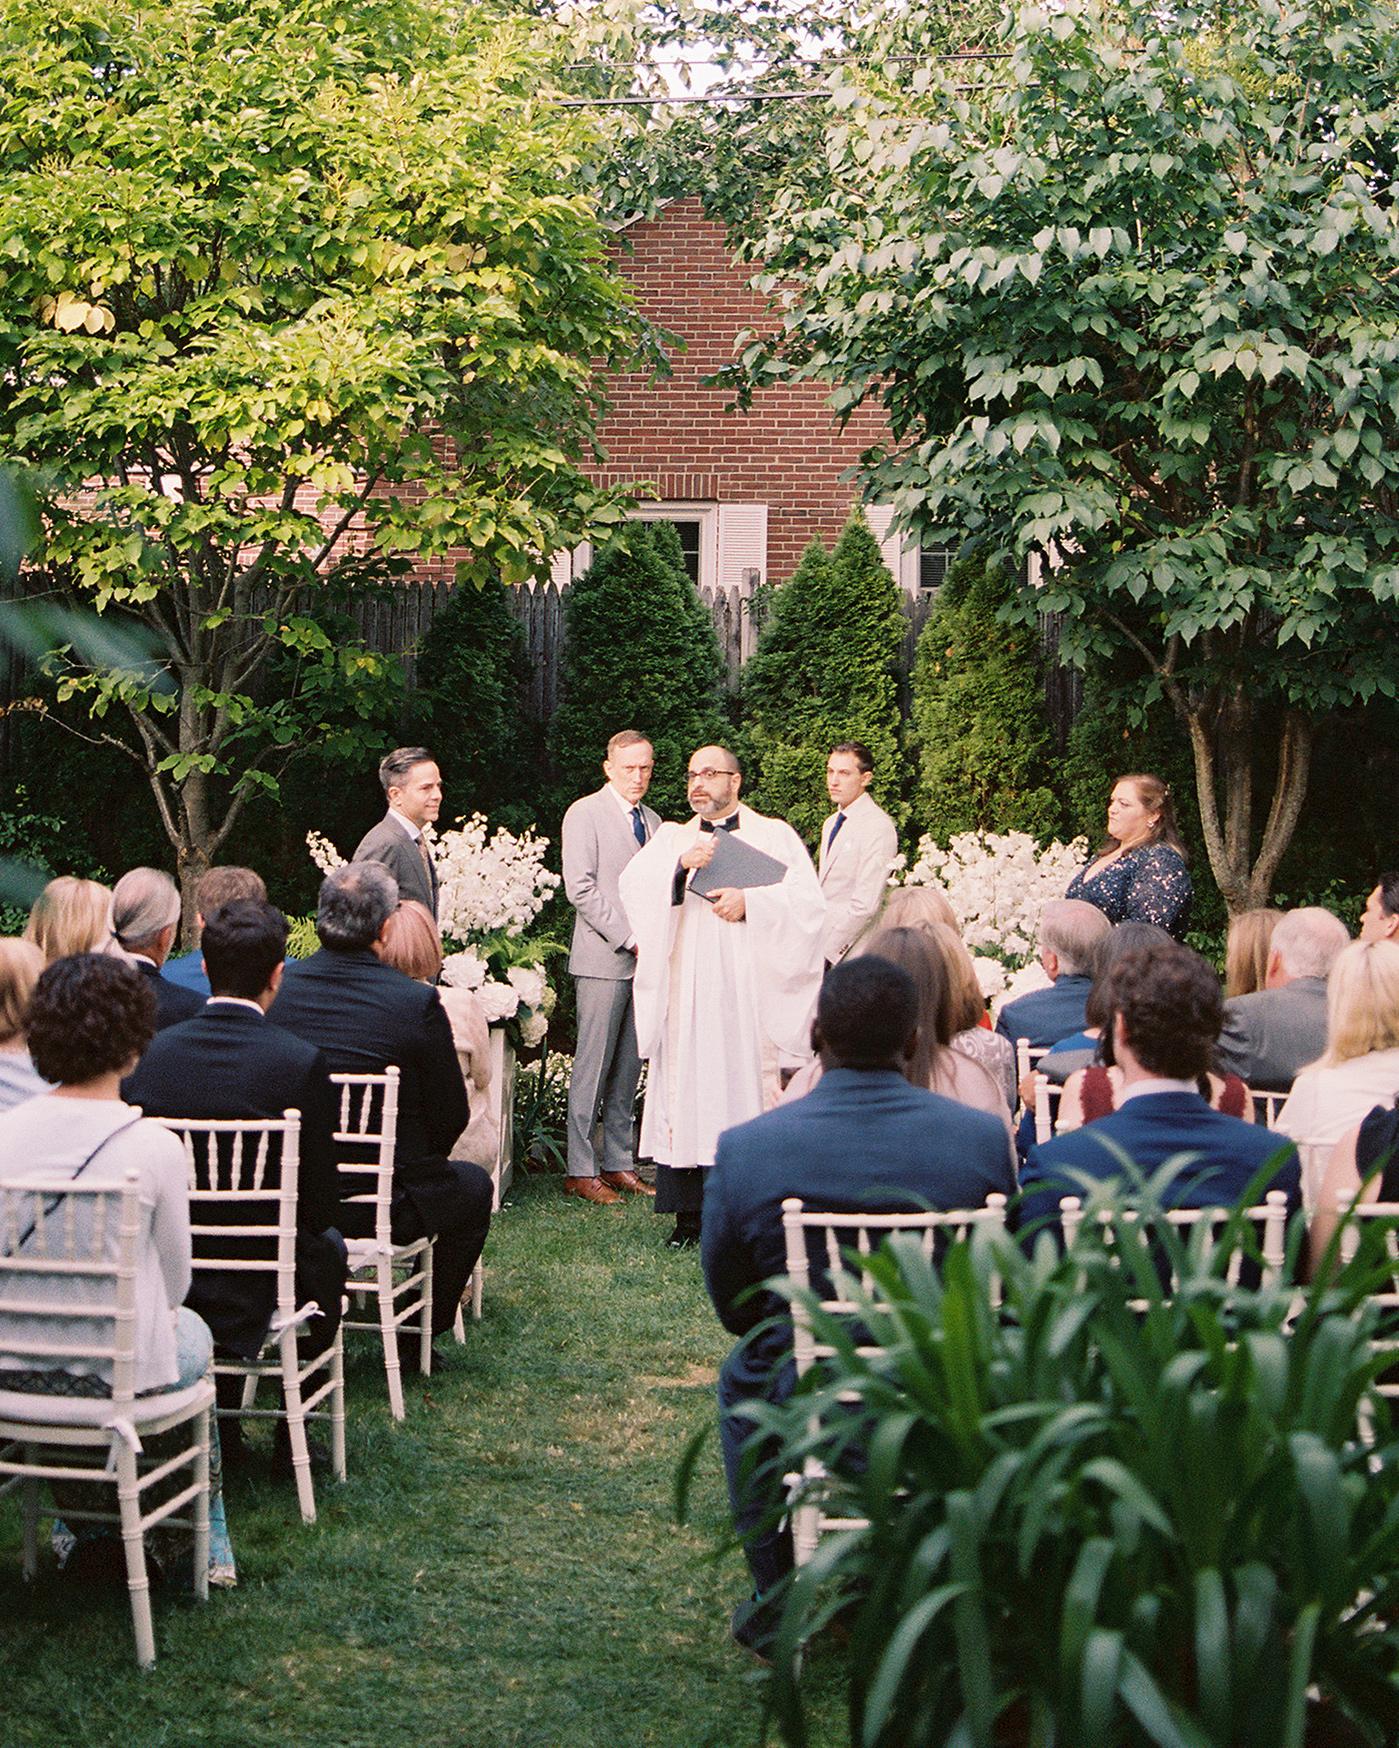 charles andrew wedding outdoor ceremony